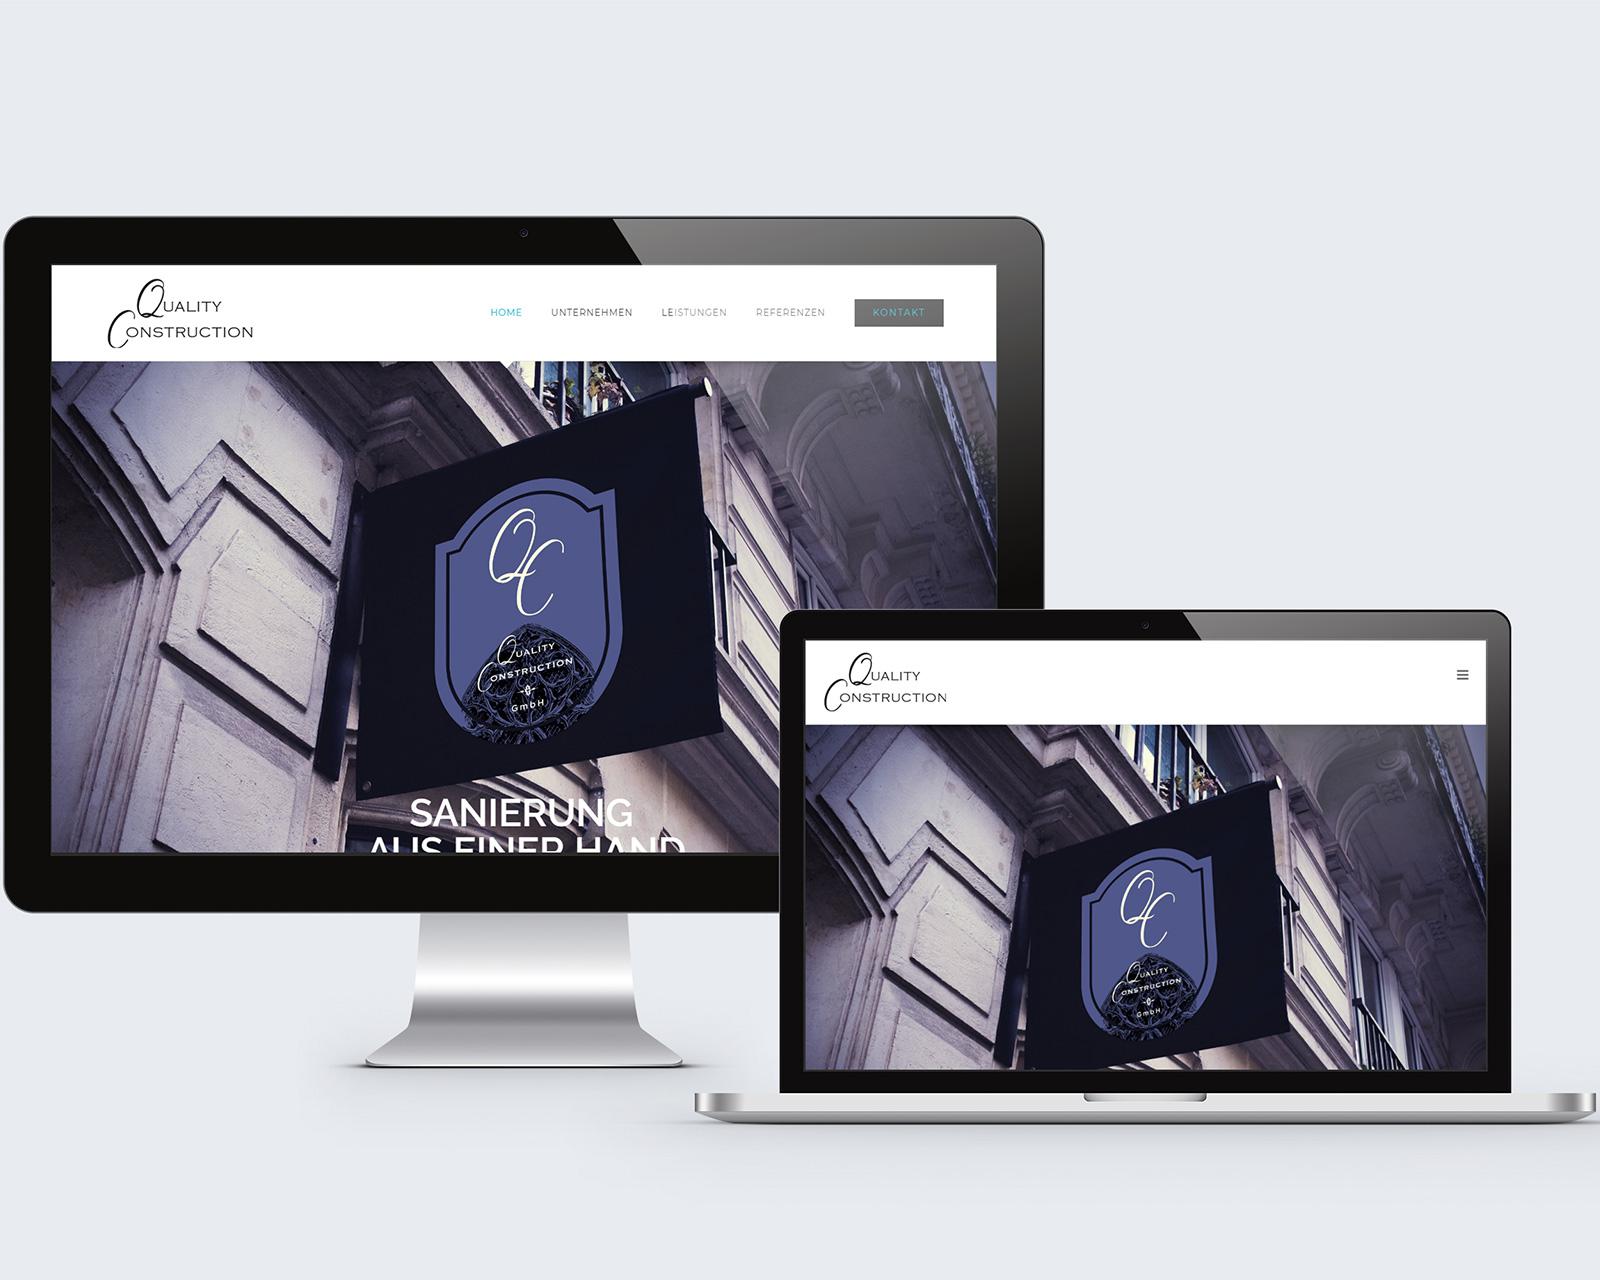 qc-gmbh-portfolio